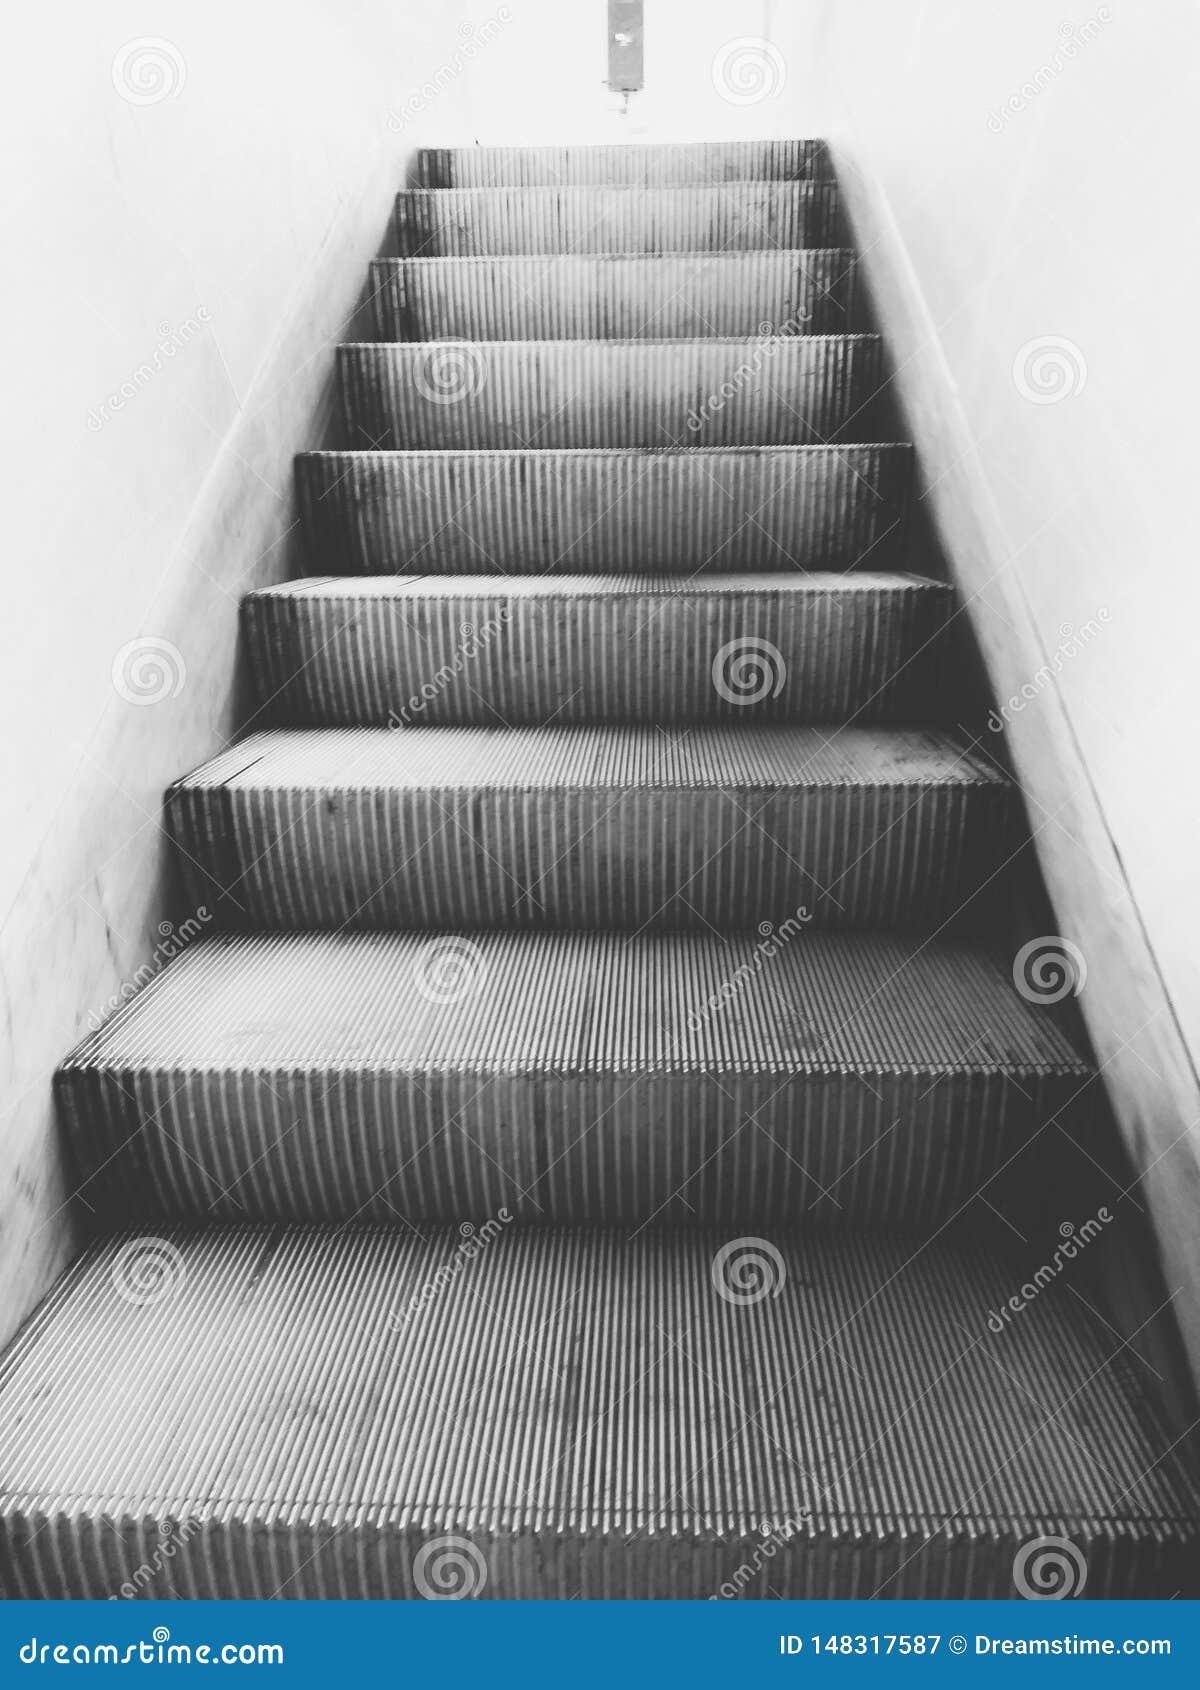 Steps by steps makes easier